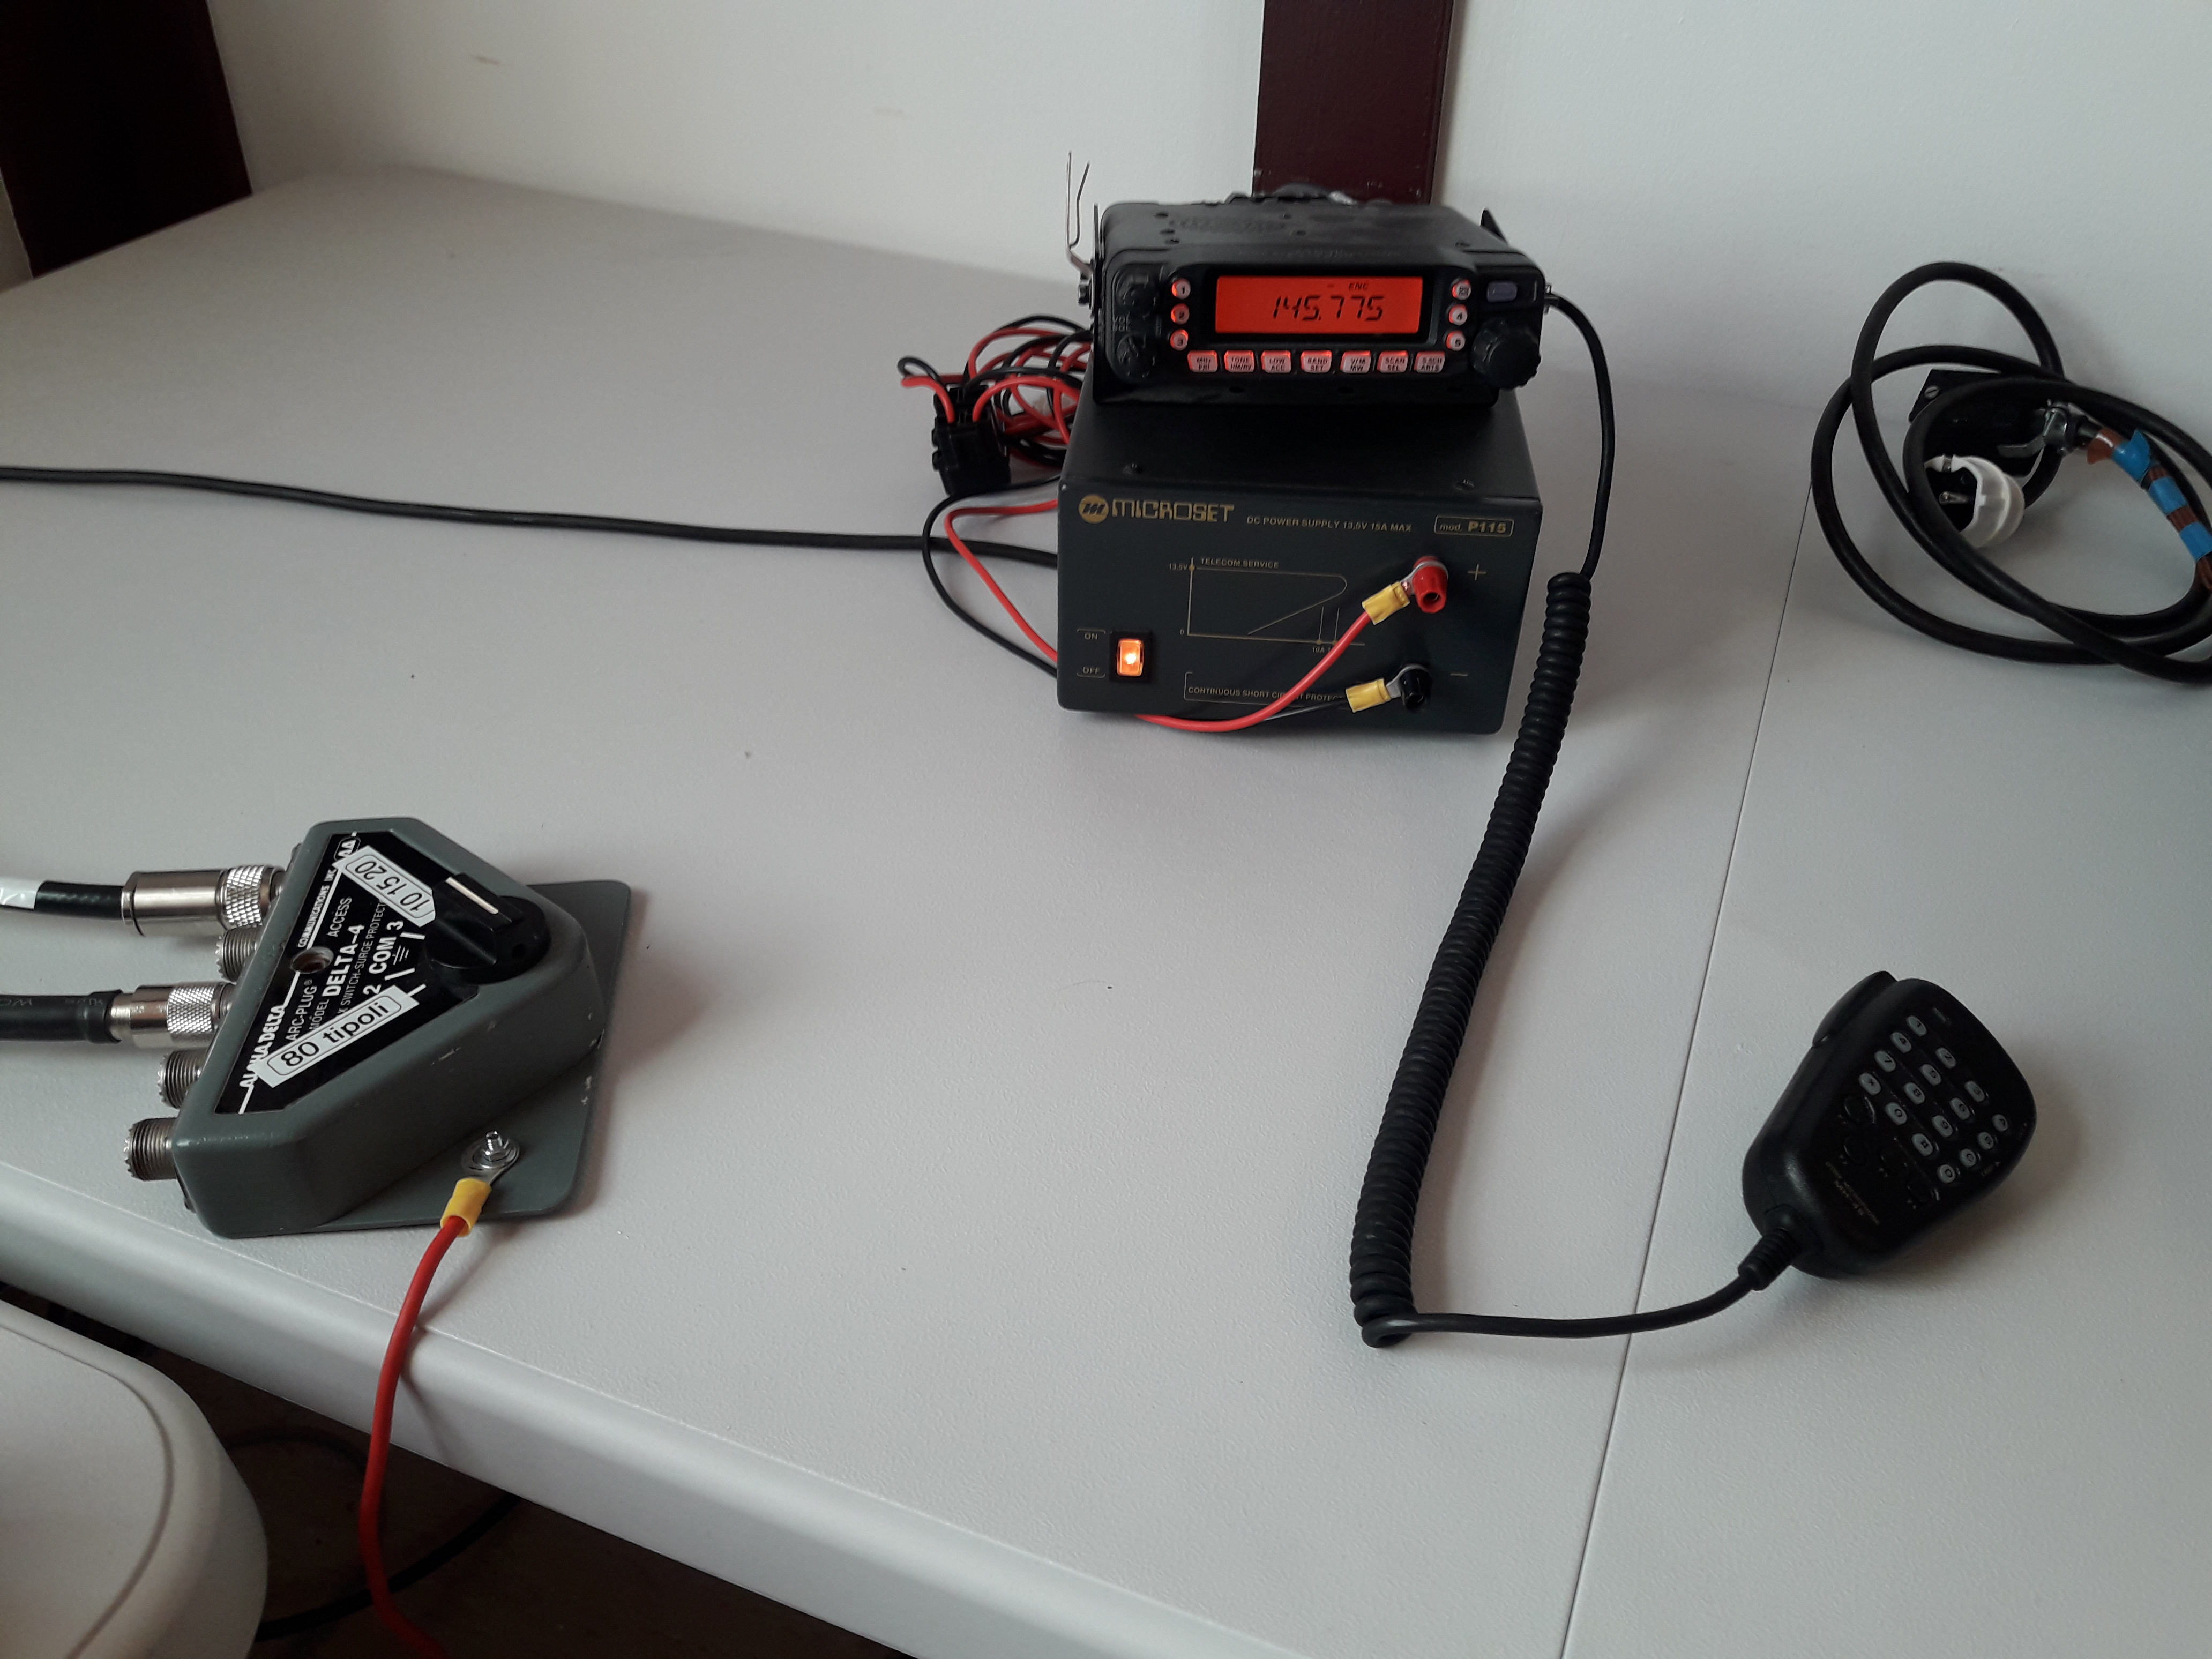 Musta, pieni radio.